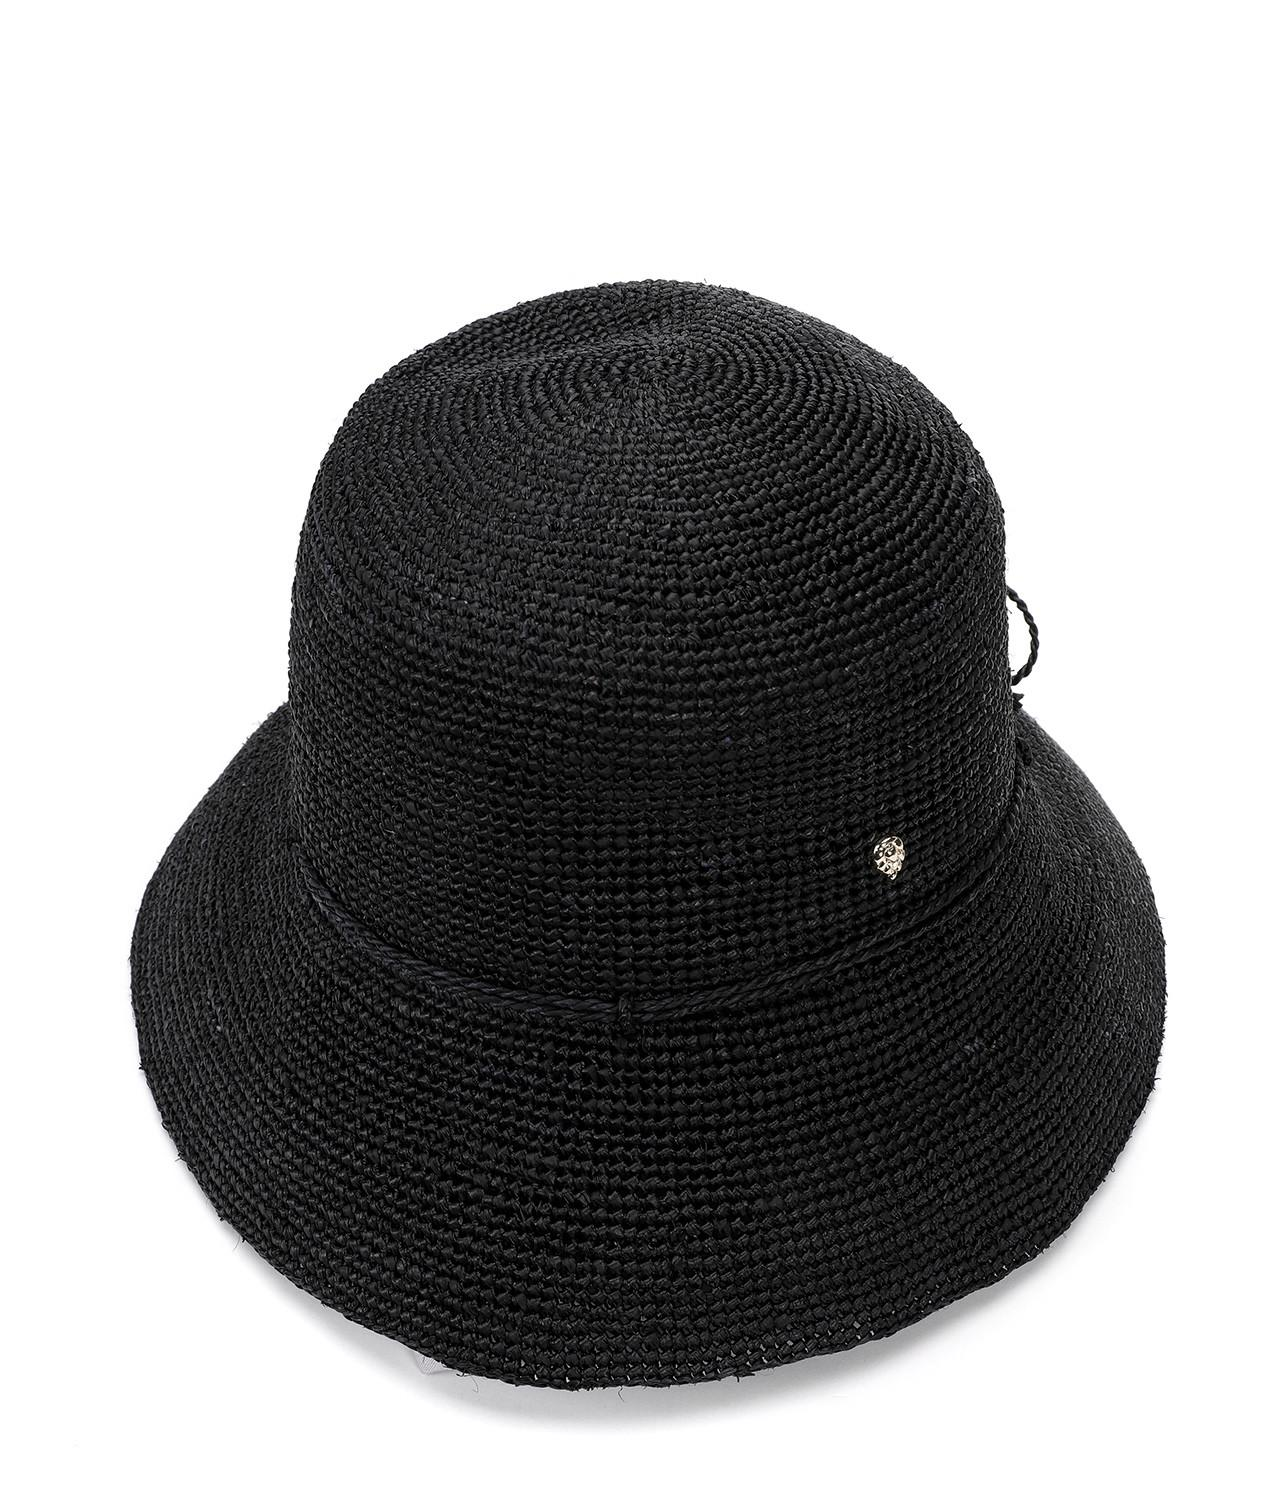 4bd5909674cbb Lyst - Helen Kaminski Provence 8 in Black